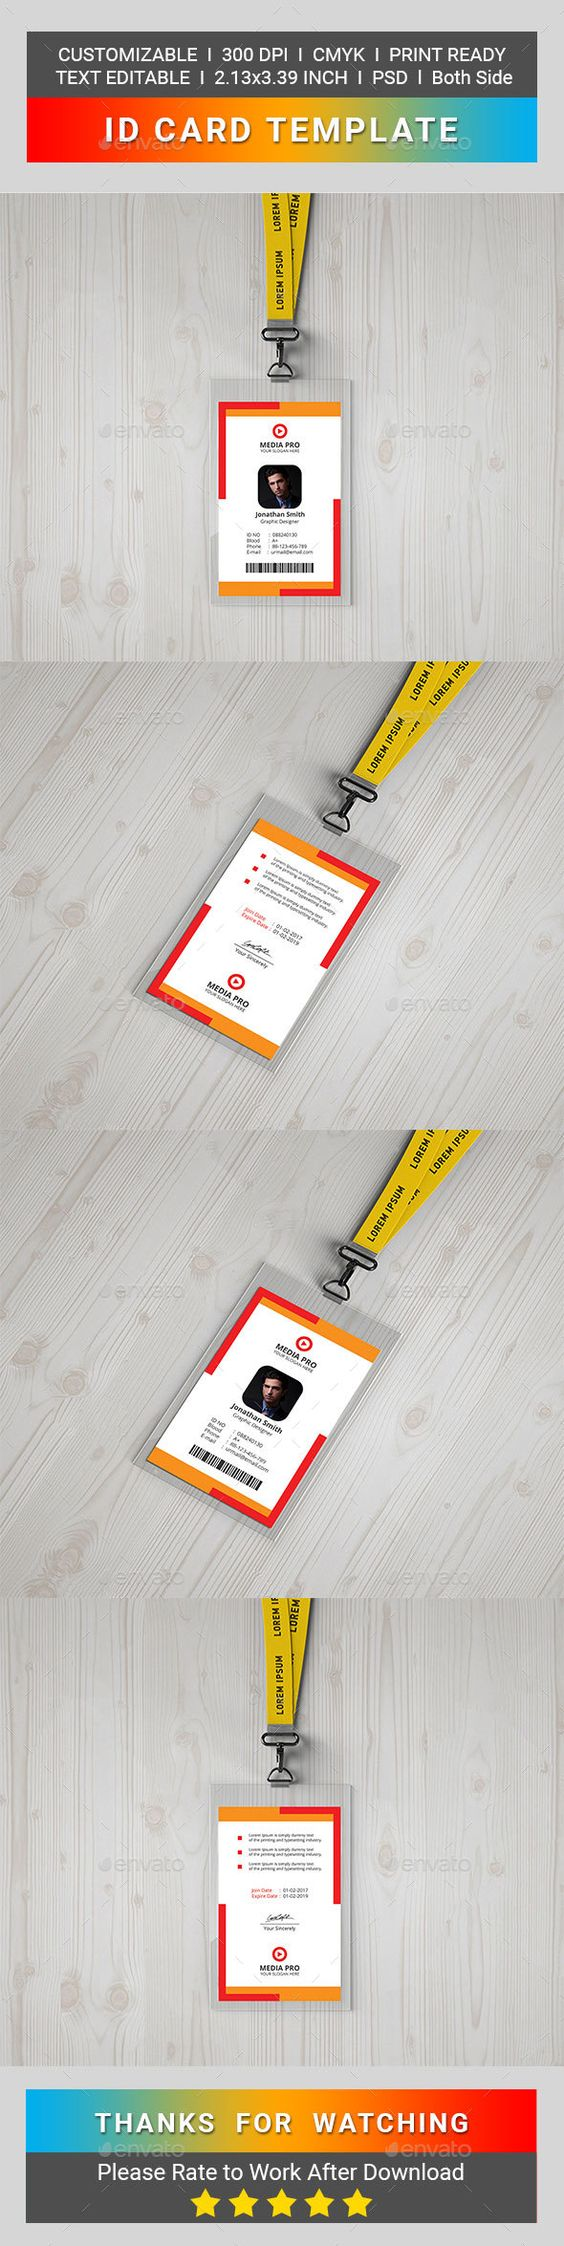 IDCard - Miscellaneous Print Templates | business card | Pinterest ...